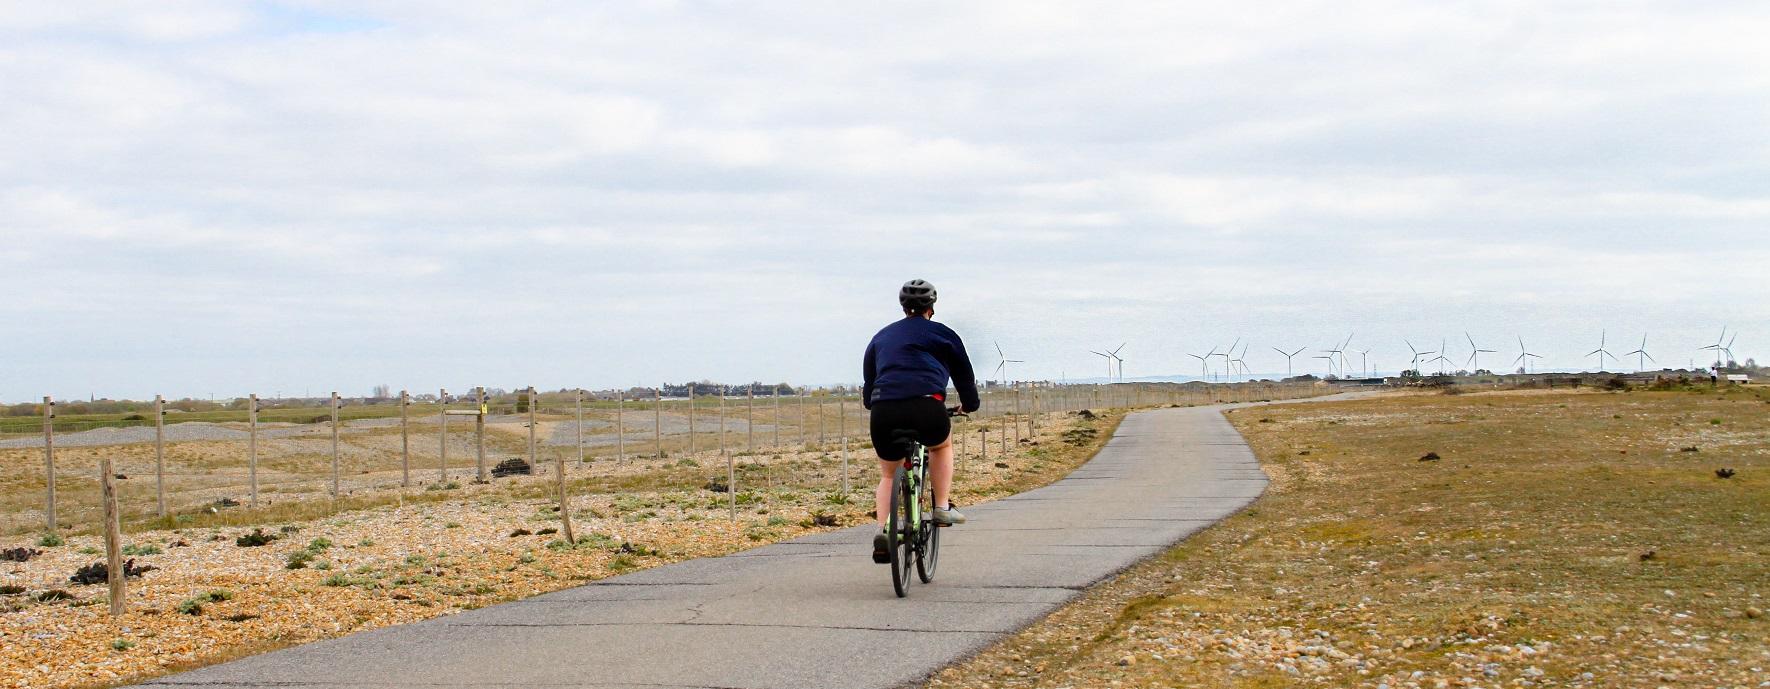 """Why I ride my bike."" - Cycle To Work Day 2021"